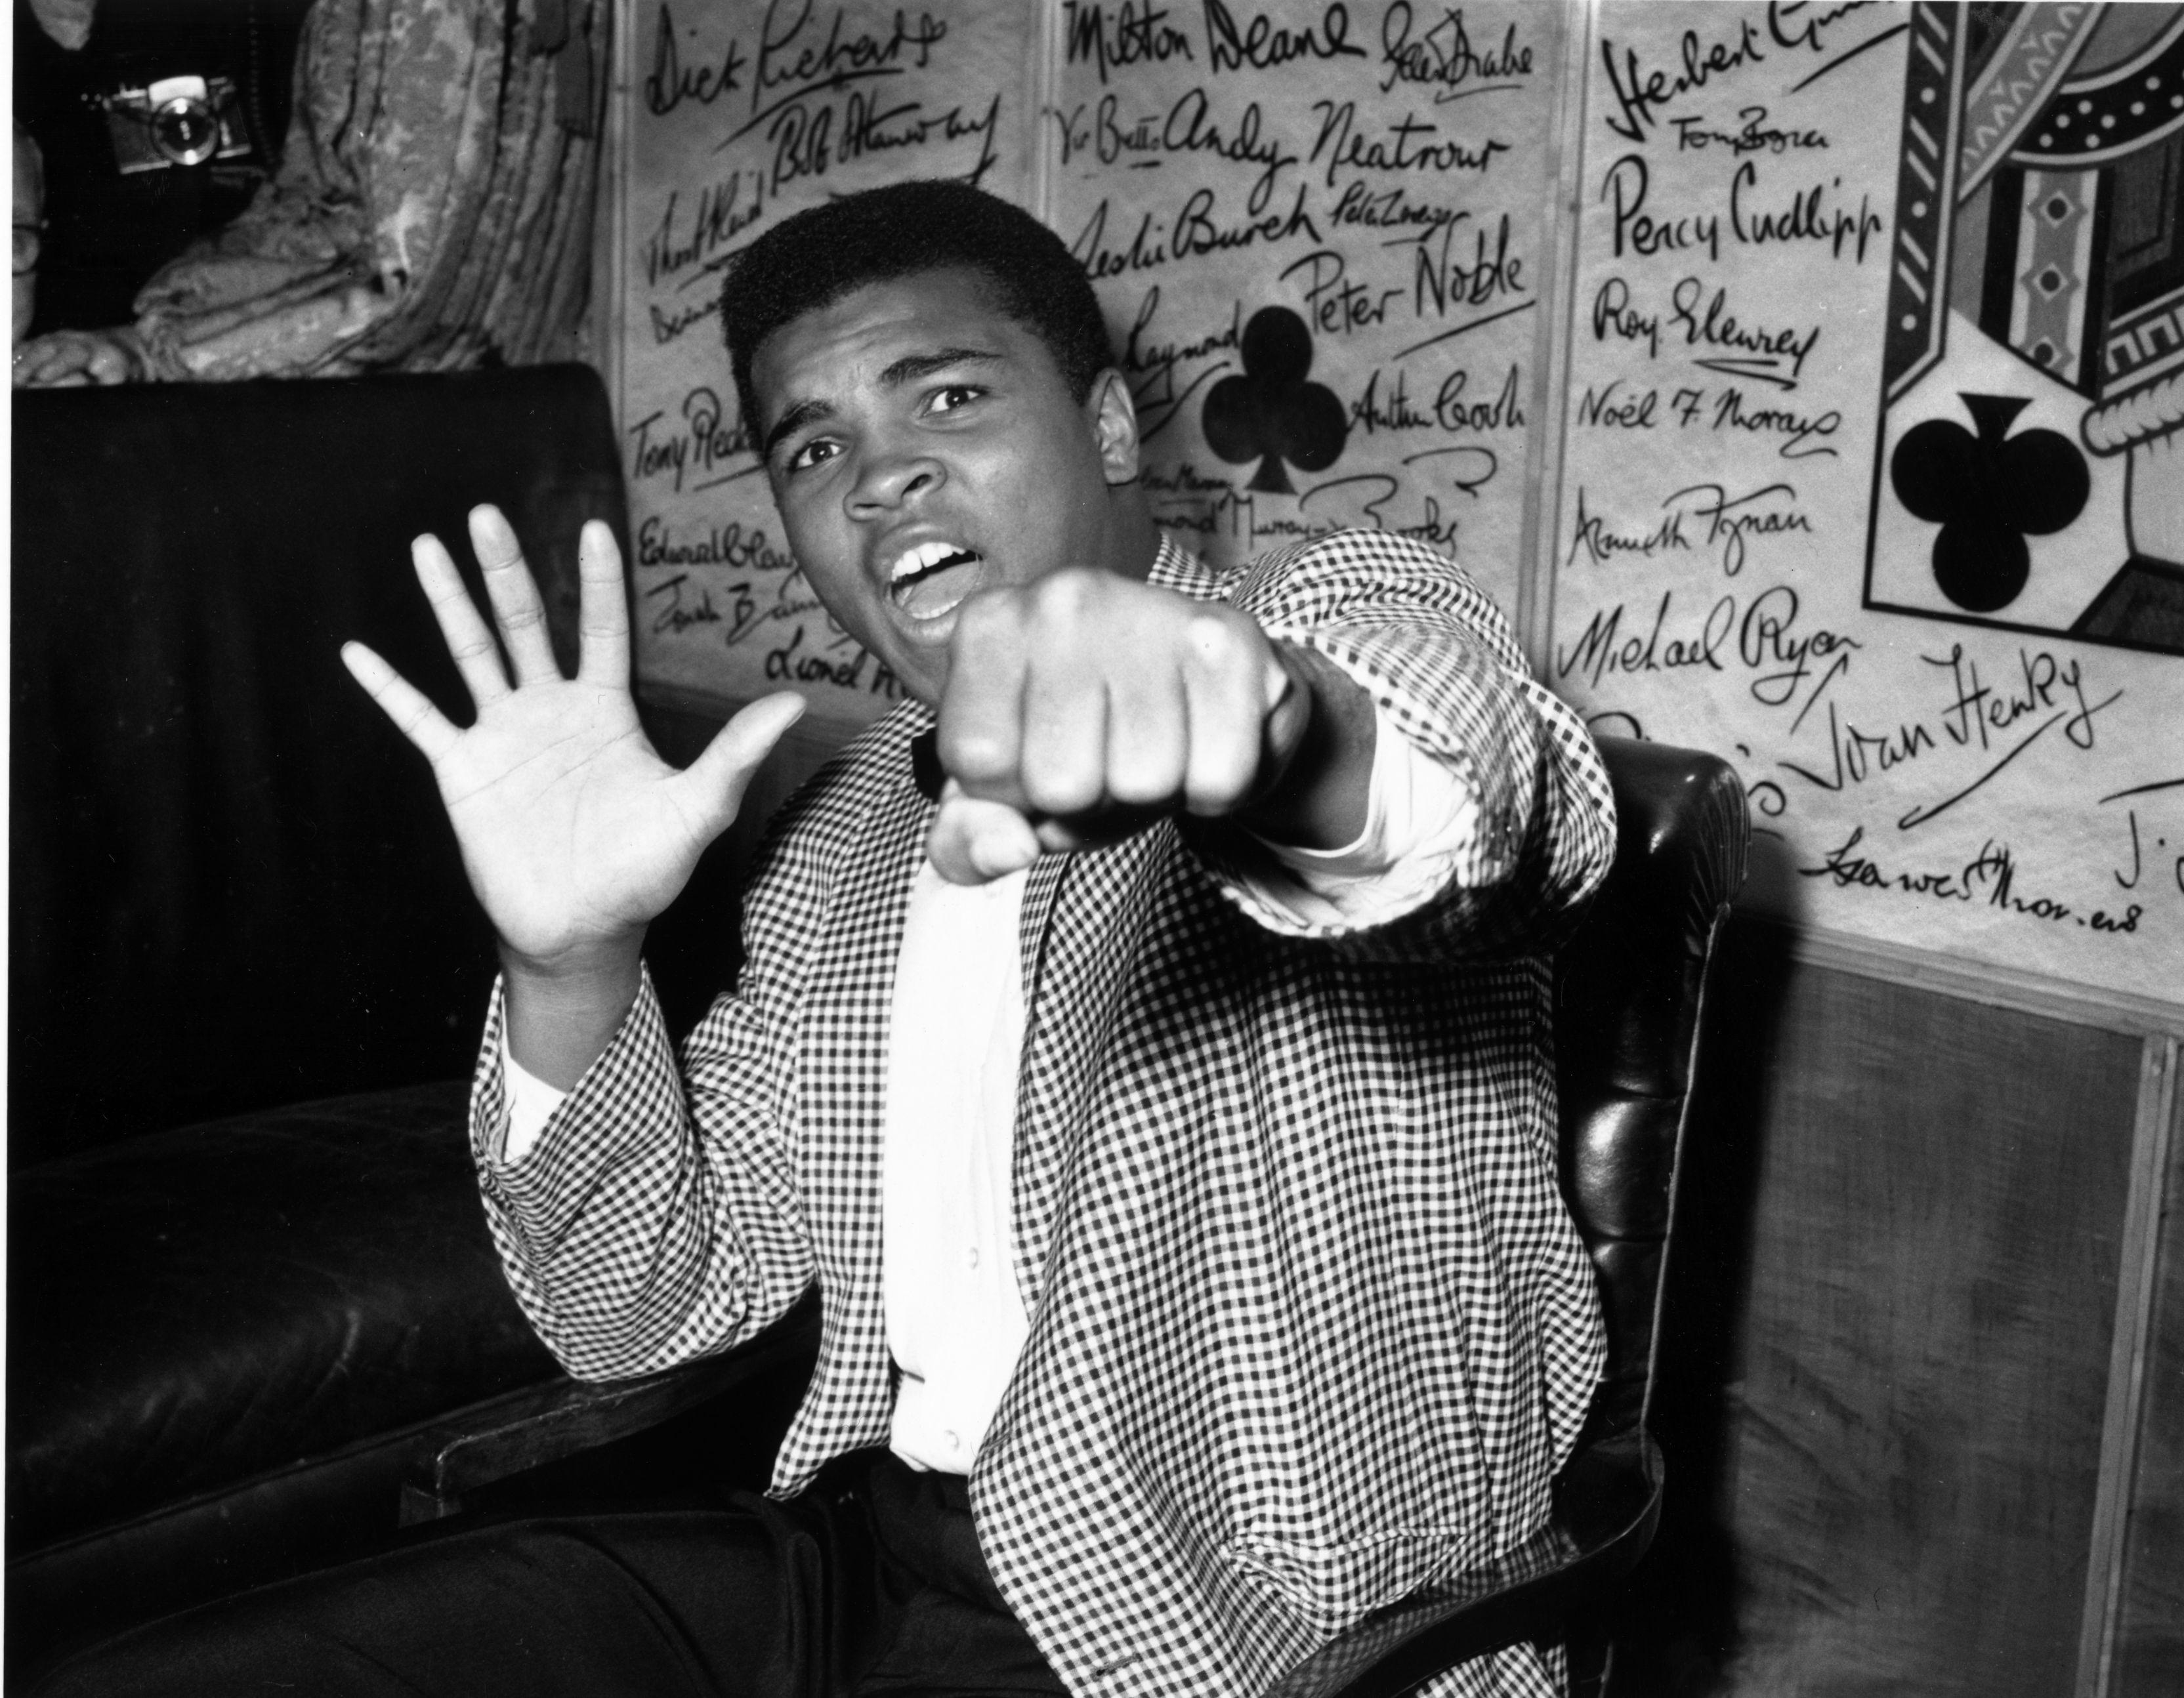 Muhammad Ali's Tragic End After Legendary Boxing Career